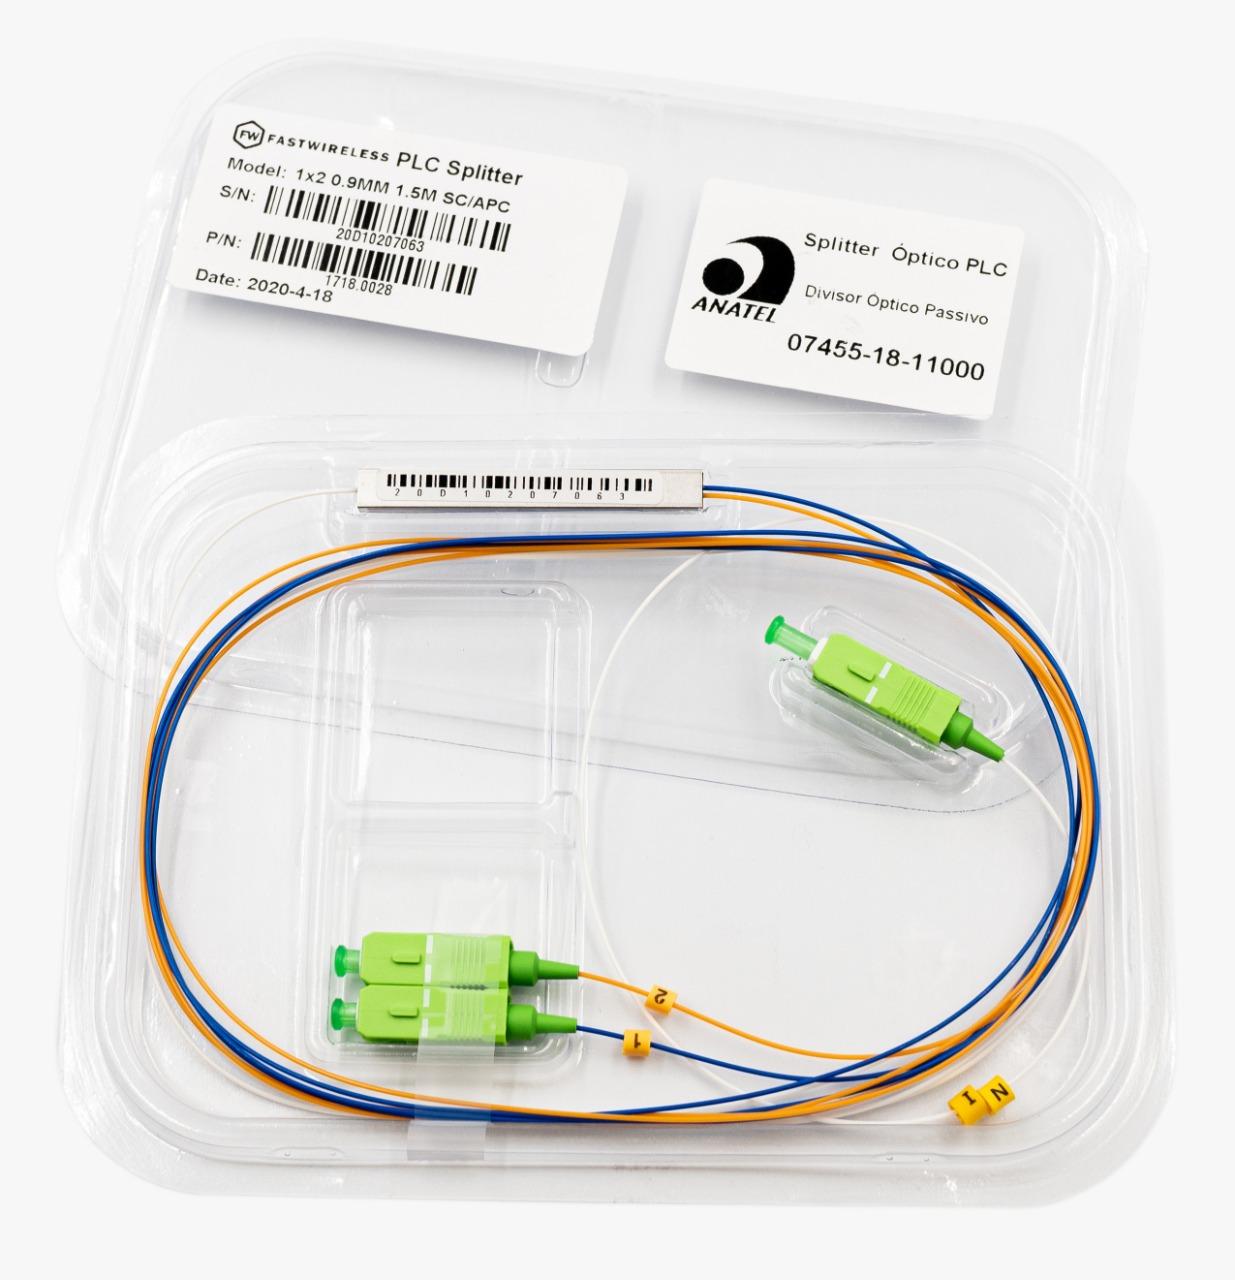 Splitter Óptico PLC 1x2 SC/APC Verde  - FASTWIRELESS